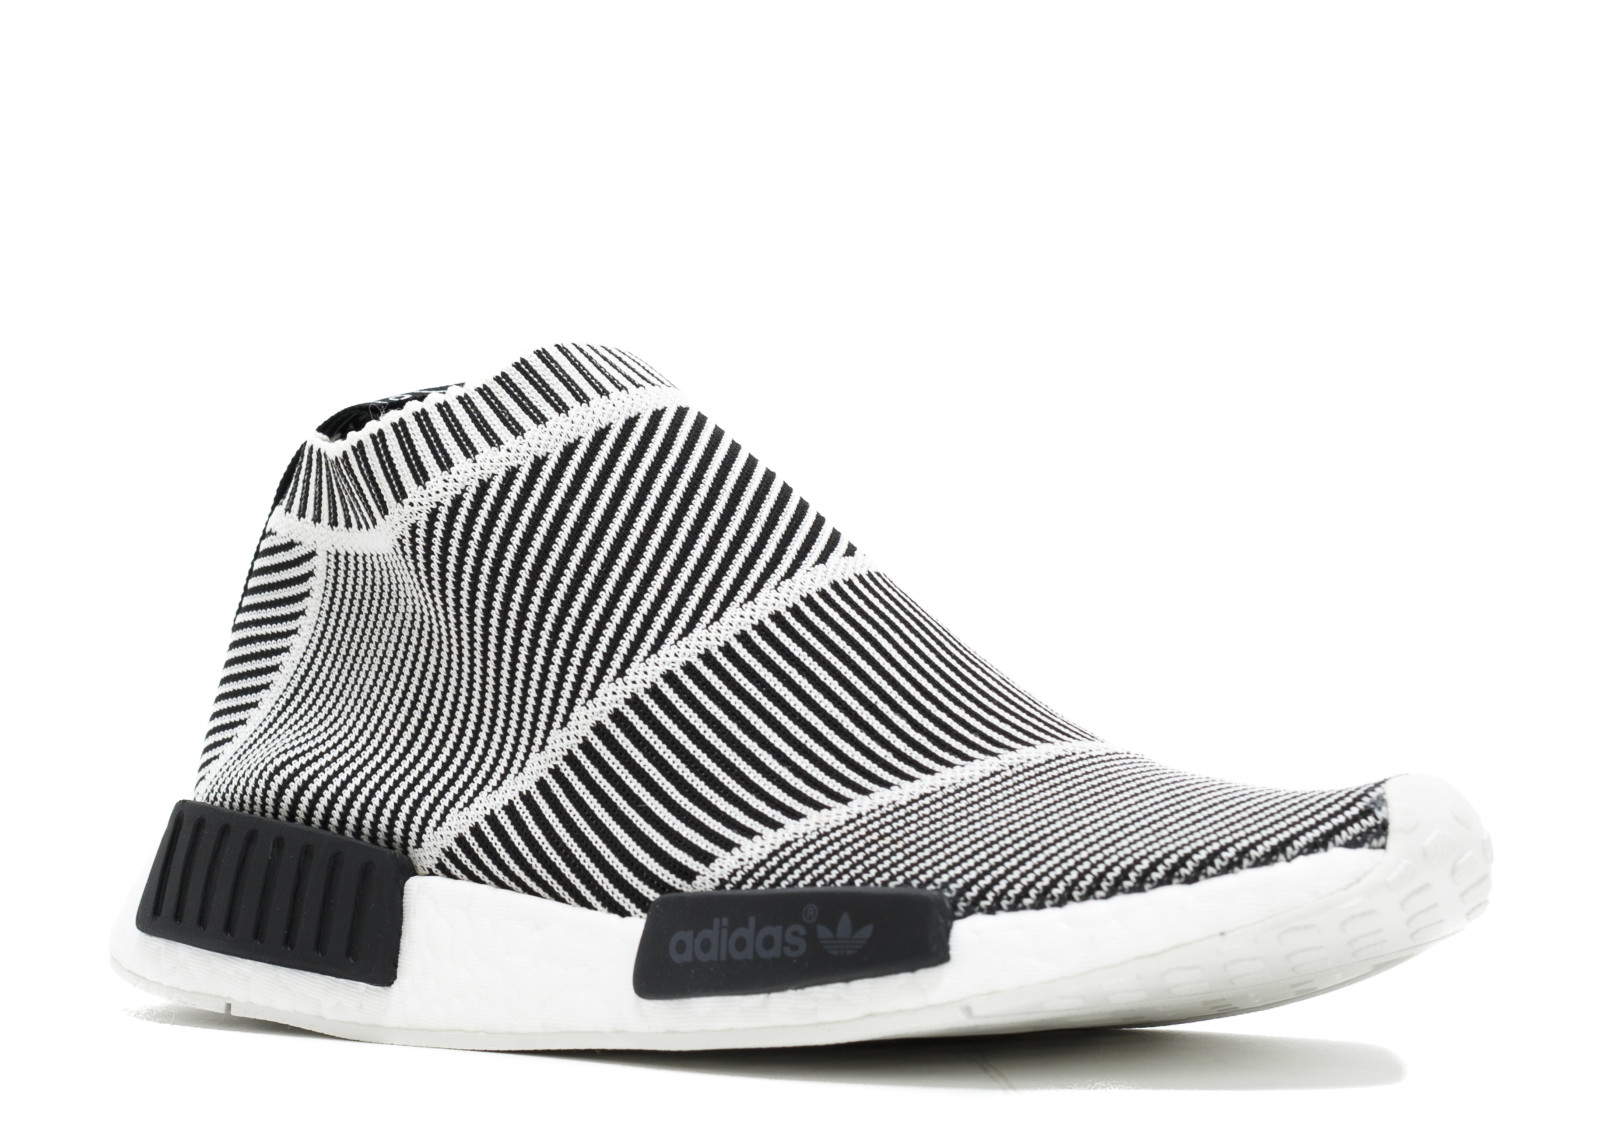 Adidas - NMD CITY SOCK PK - S79150